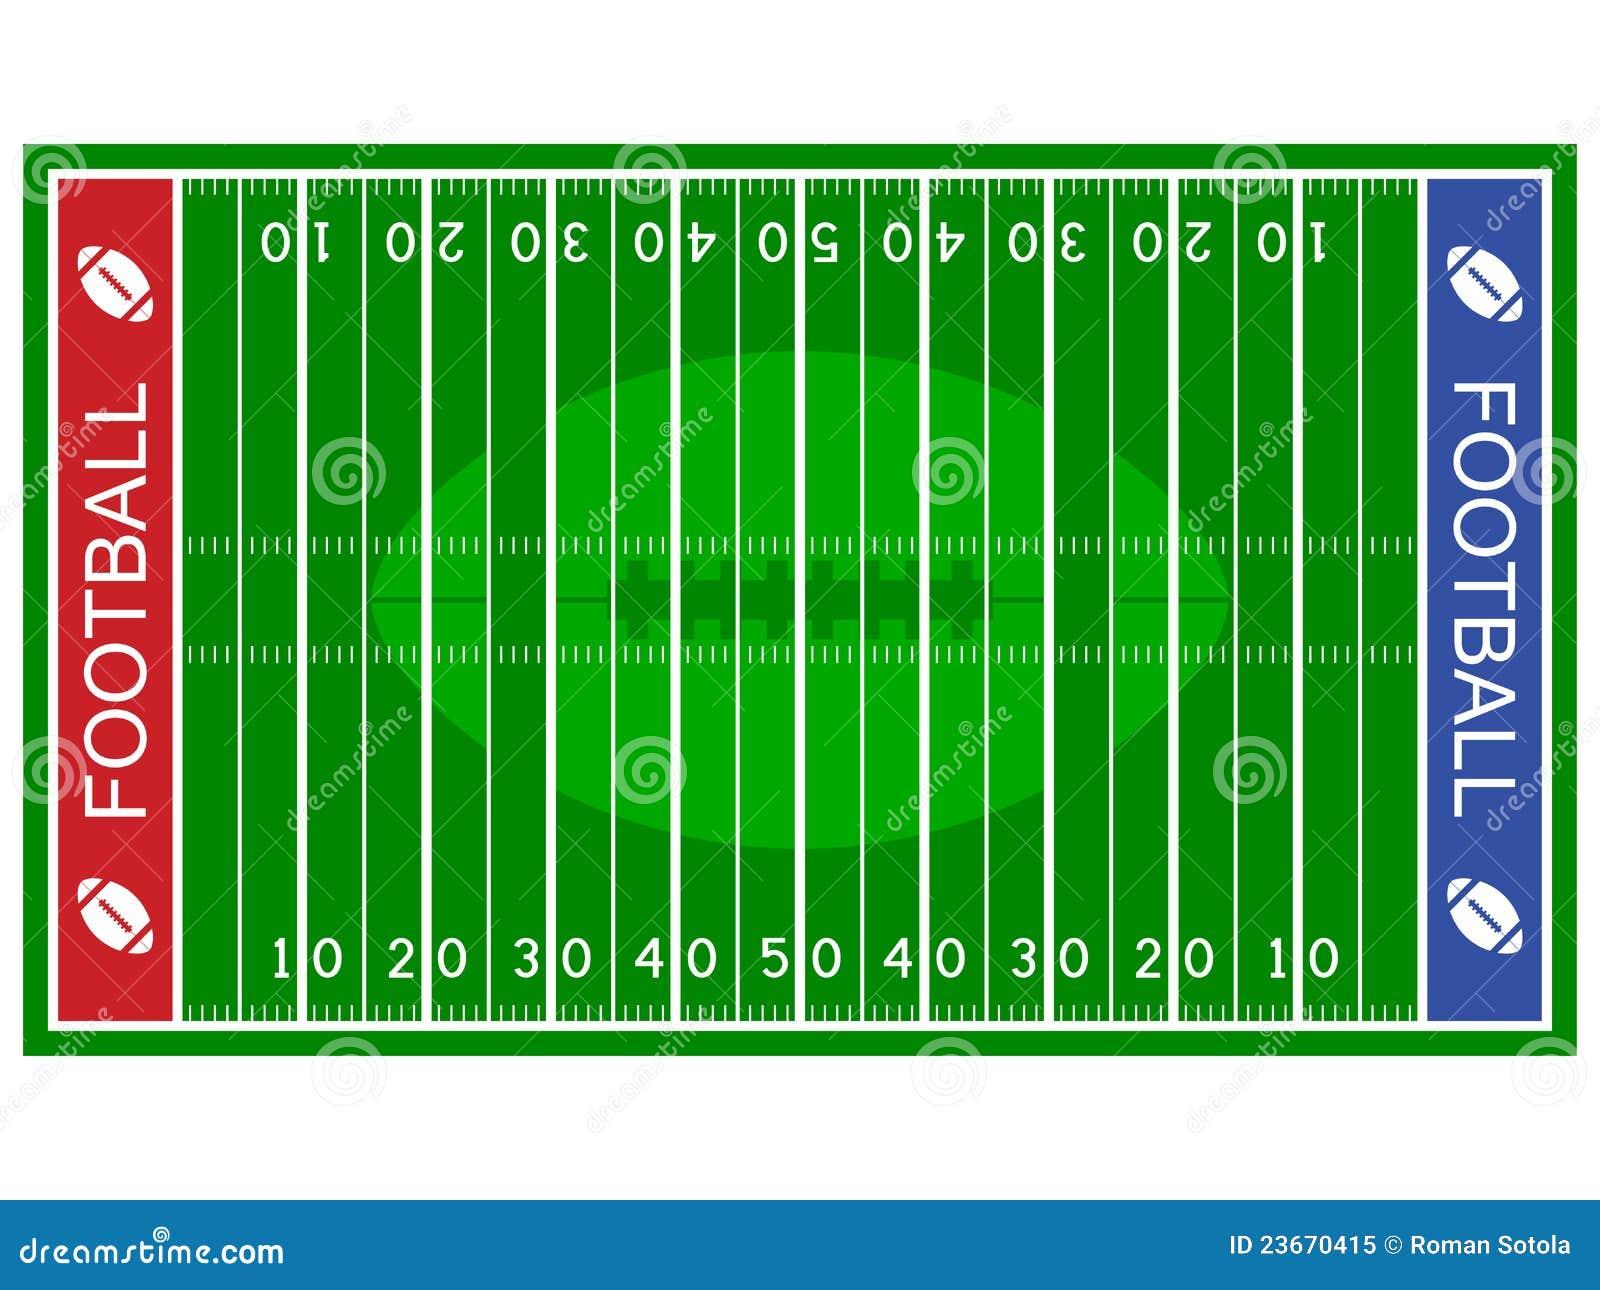 American football field stock vector. Illustration of icon - 23670415